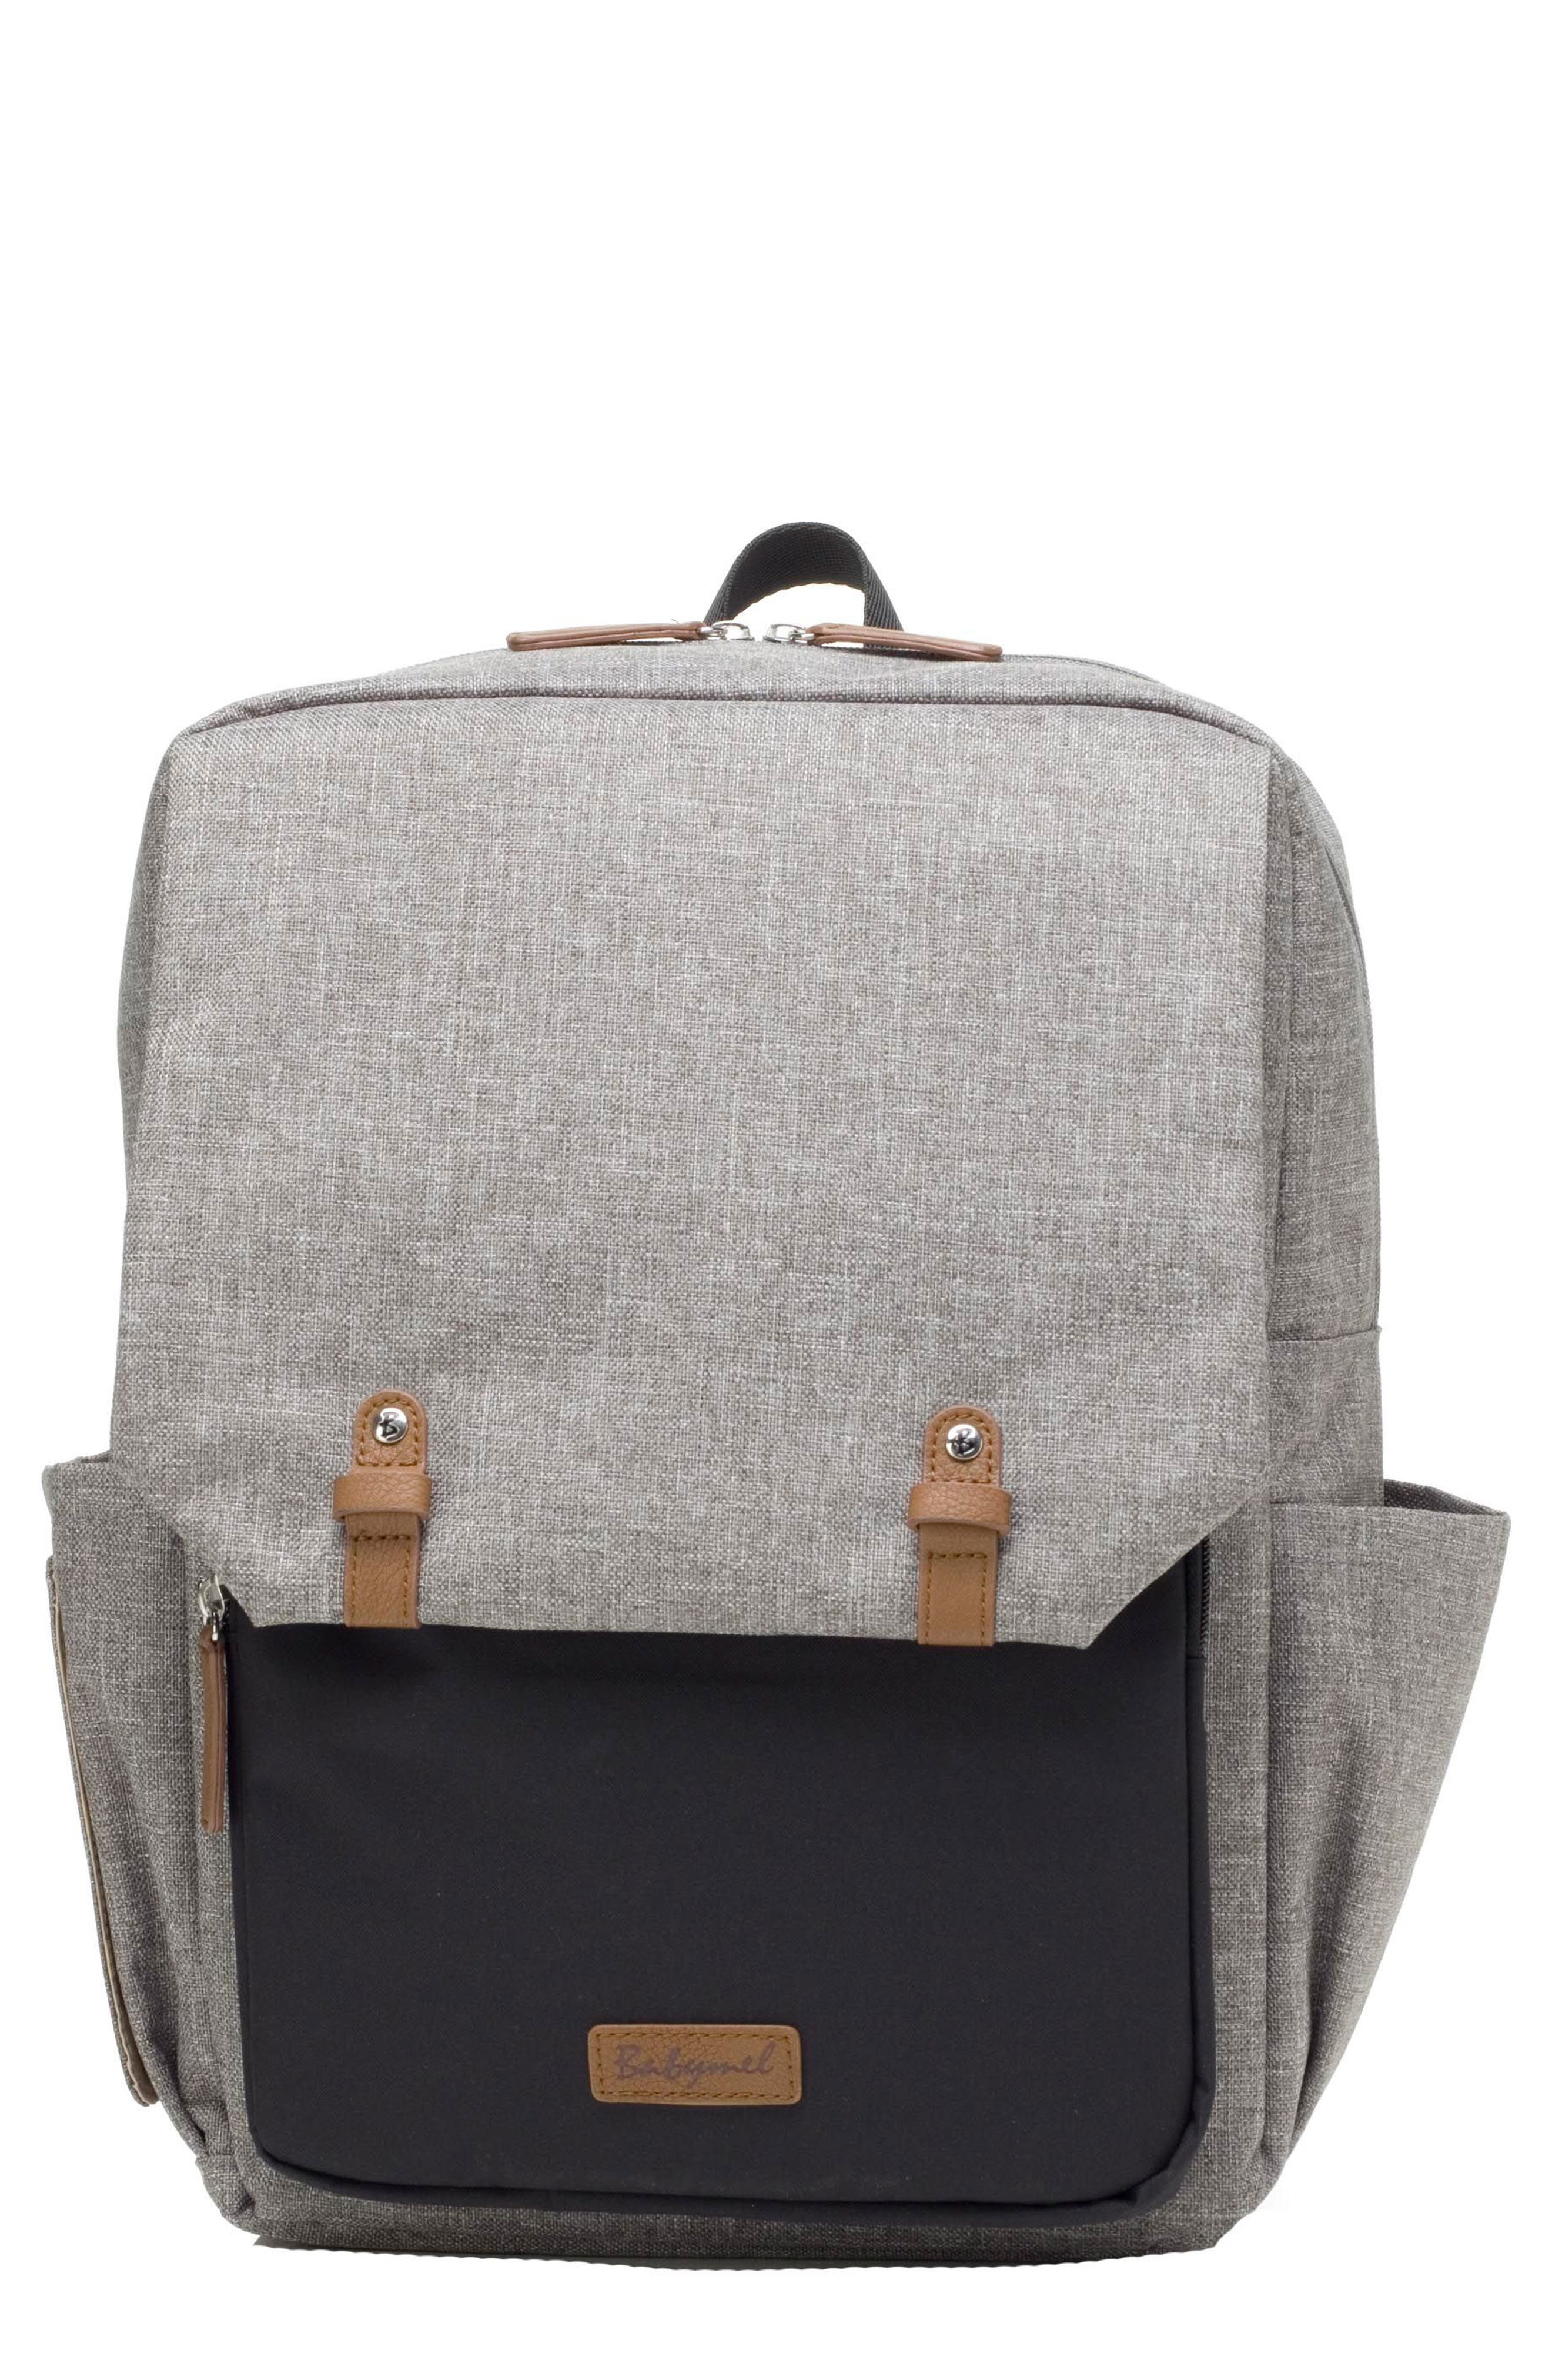 George Water Resistant Diaper Backpack,                             Main thumbnail 1, color,                             BLACK/ GREY